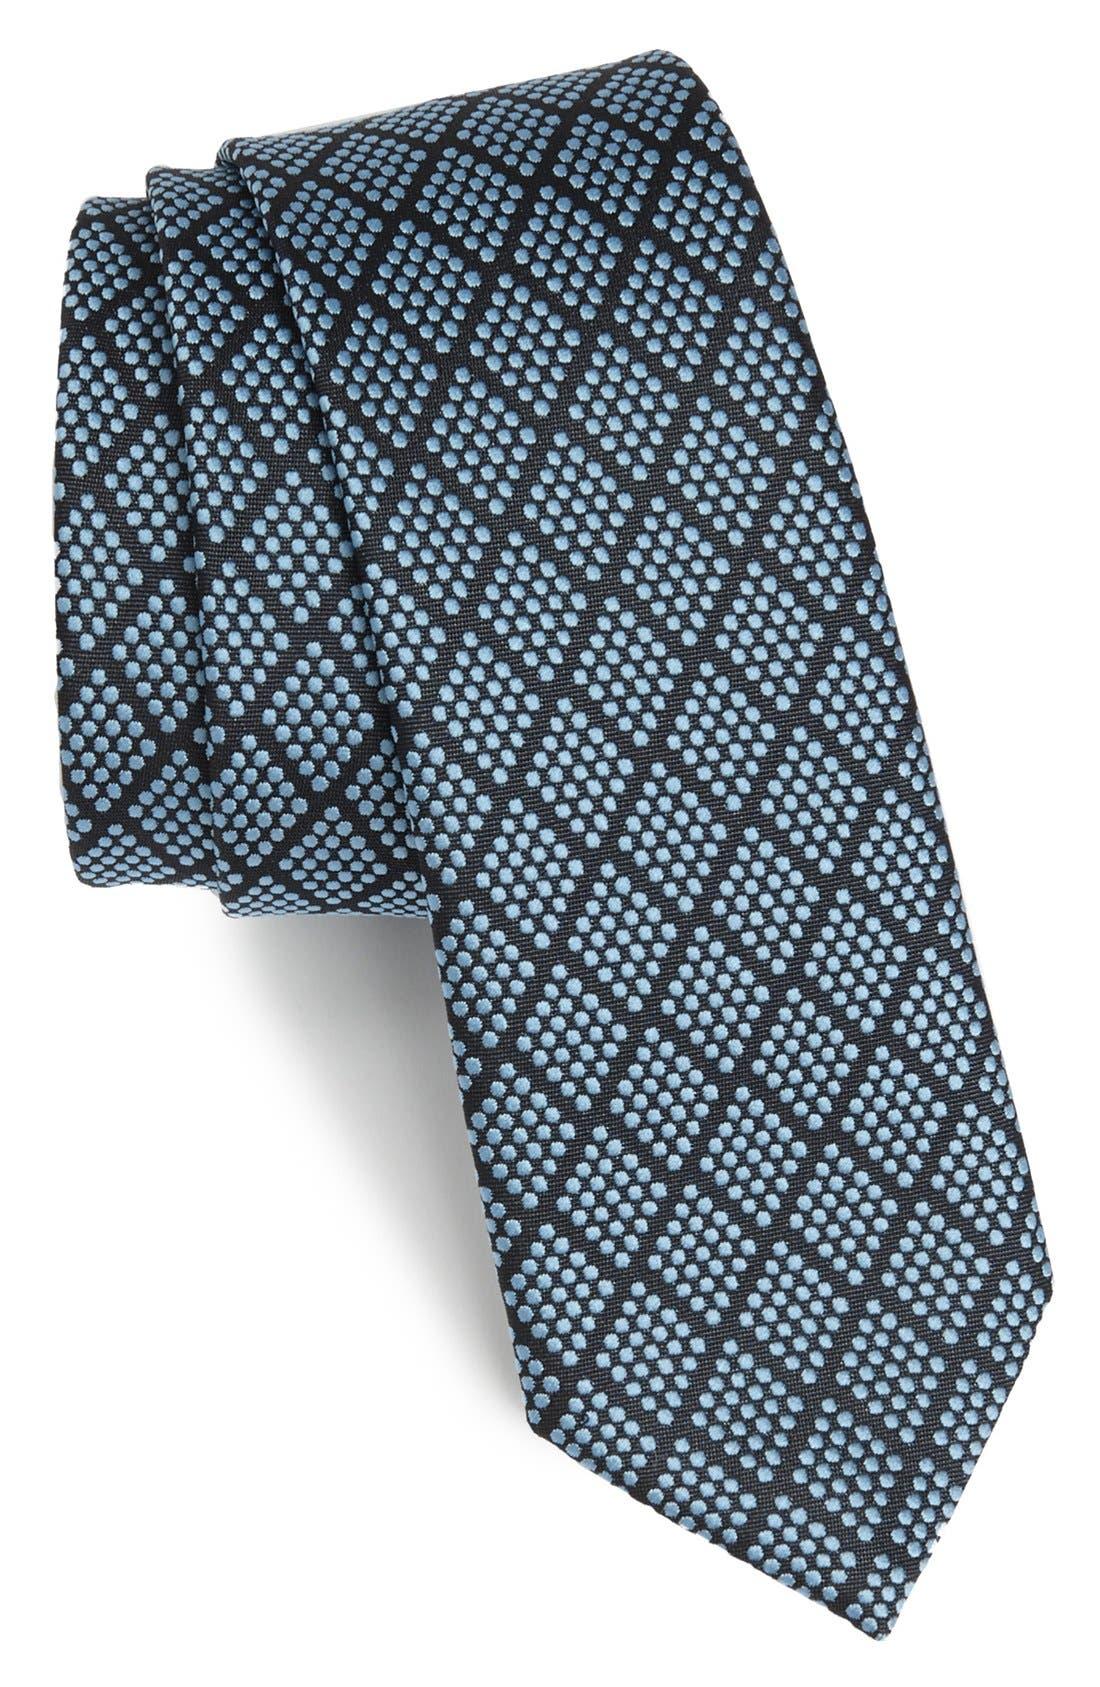 Alternate Image 1 Selected - Z Zegna Woven Silk Blend Tie